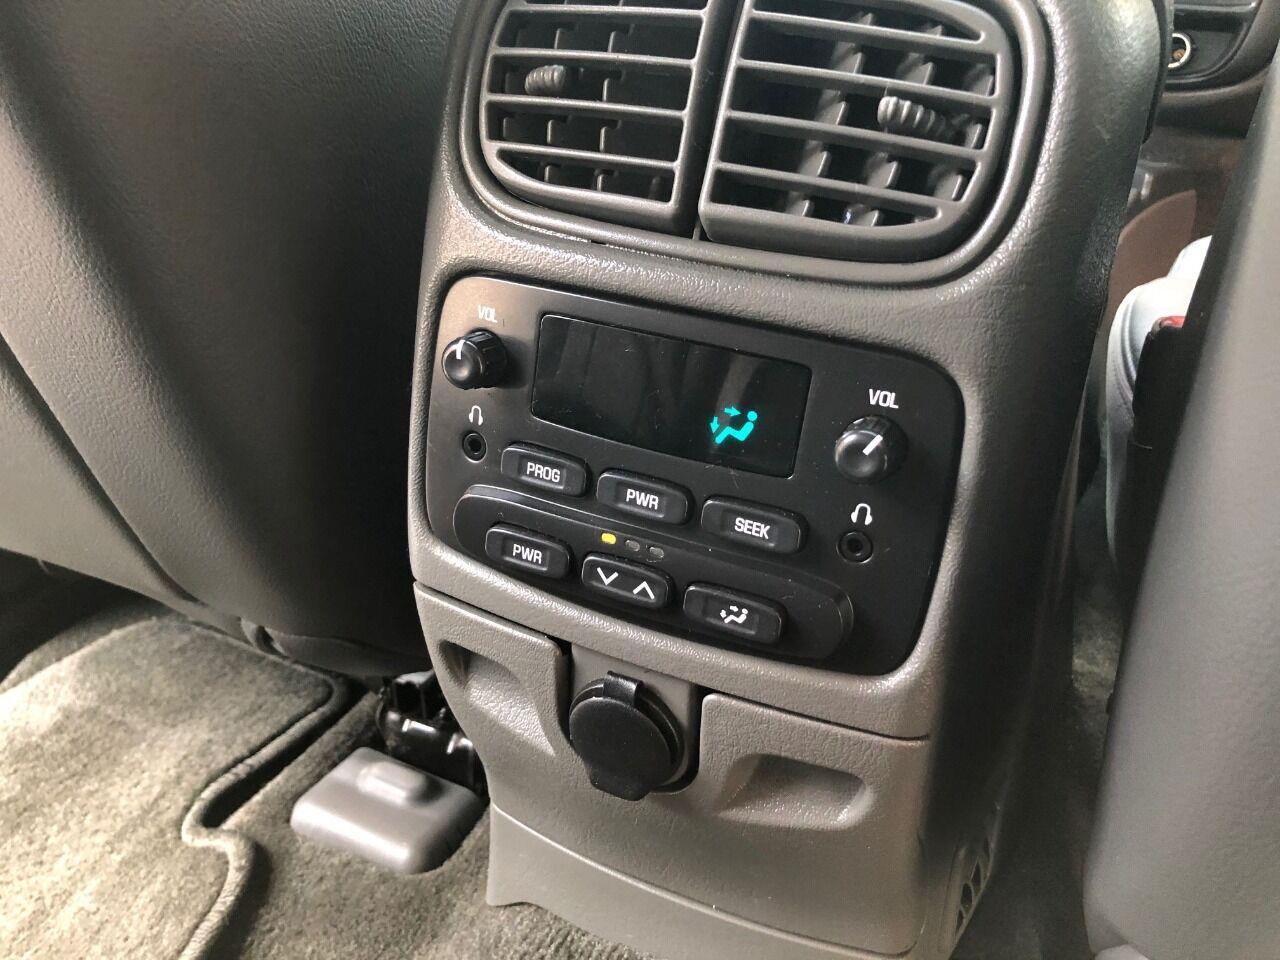 2002 Chevrolet Trailblazer (CC-1364023) for sale in Saint Charles, Missouri